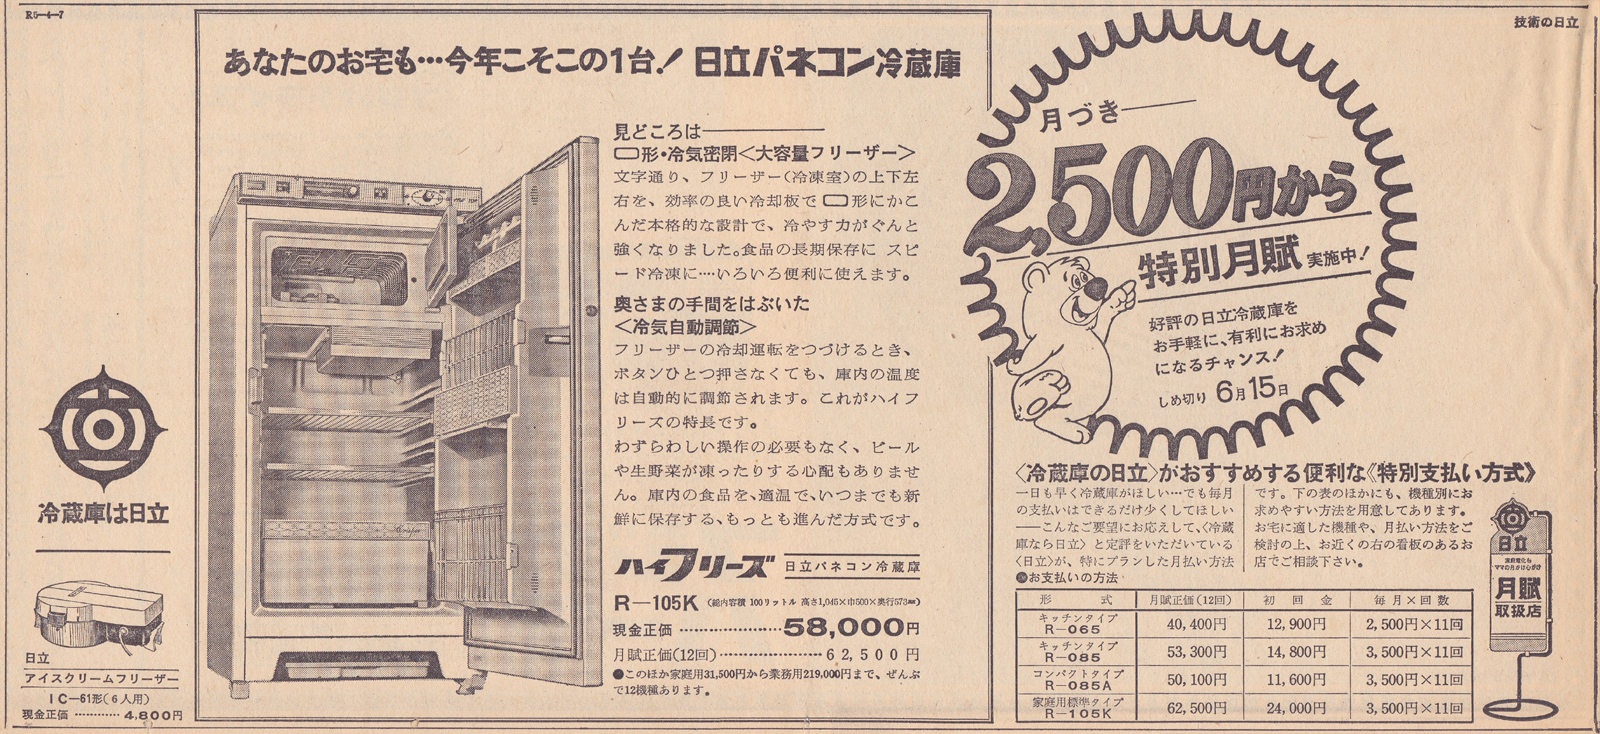 19650418c.jpg